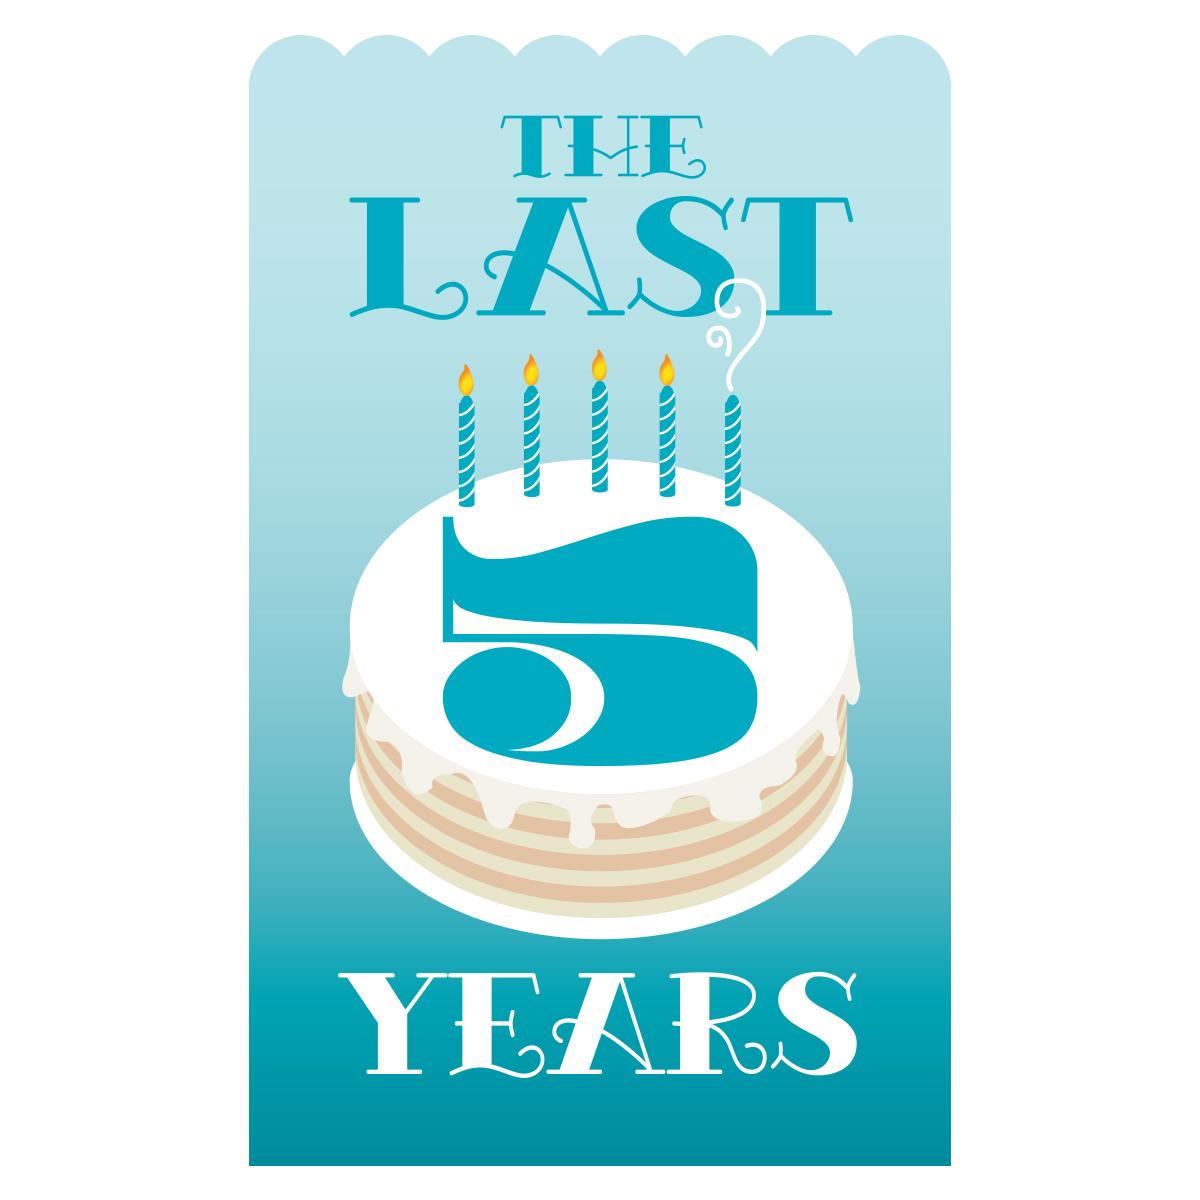 The Last 5 Years, Kokandy Productions